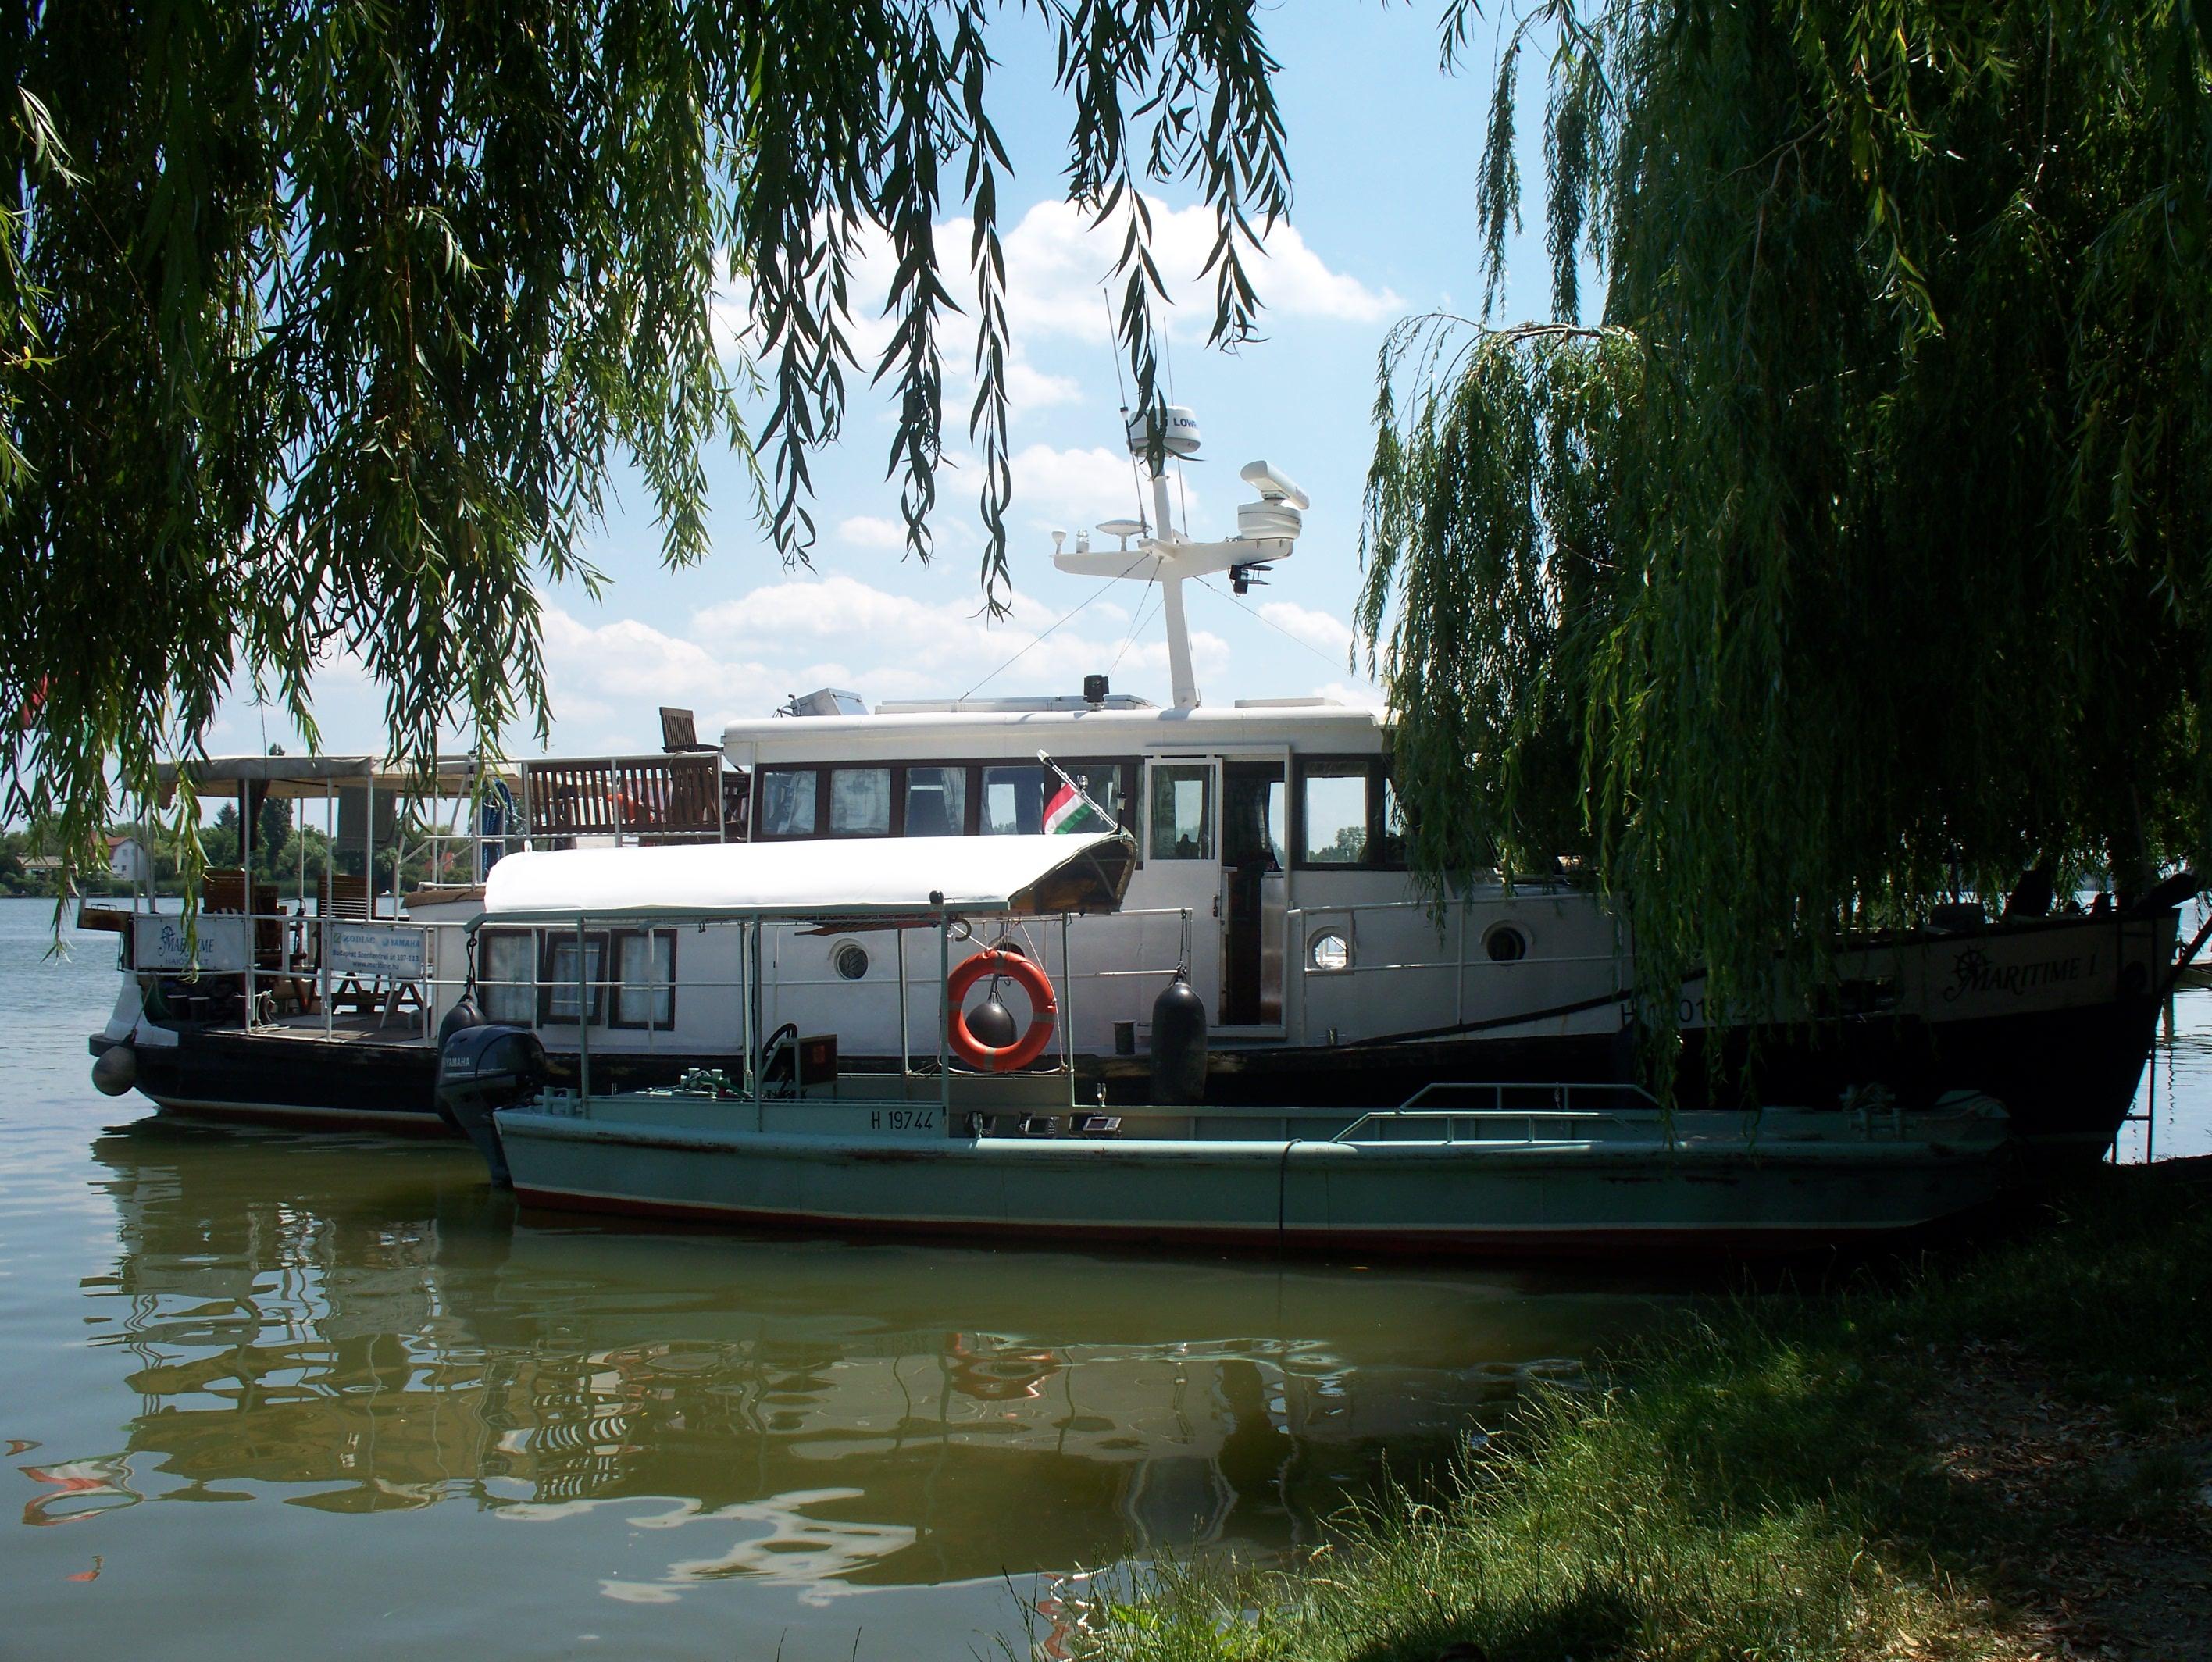 http://www.kisdunainagyhajok.hu/egyebhajok/2012_06_24_maritime_motoros_vonatohajo_a_rackevei_piacnal/2012_06_24_maritime_motoros_vonatohajo_a_rackevei_piacnal_008.jpg